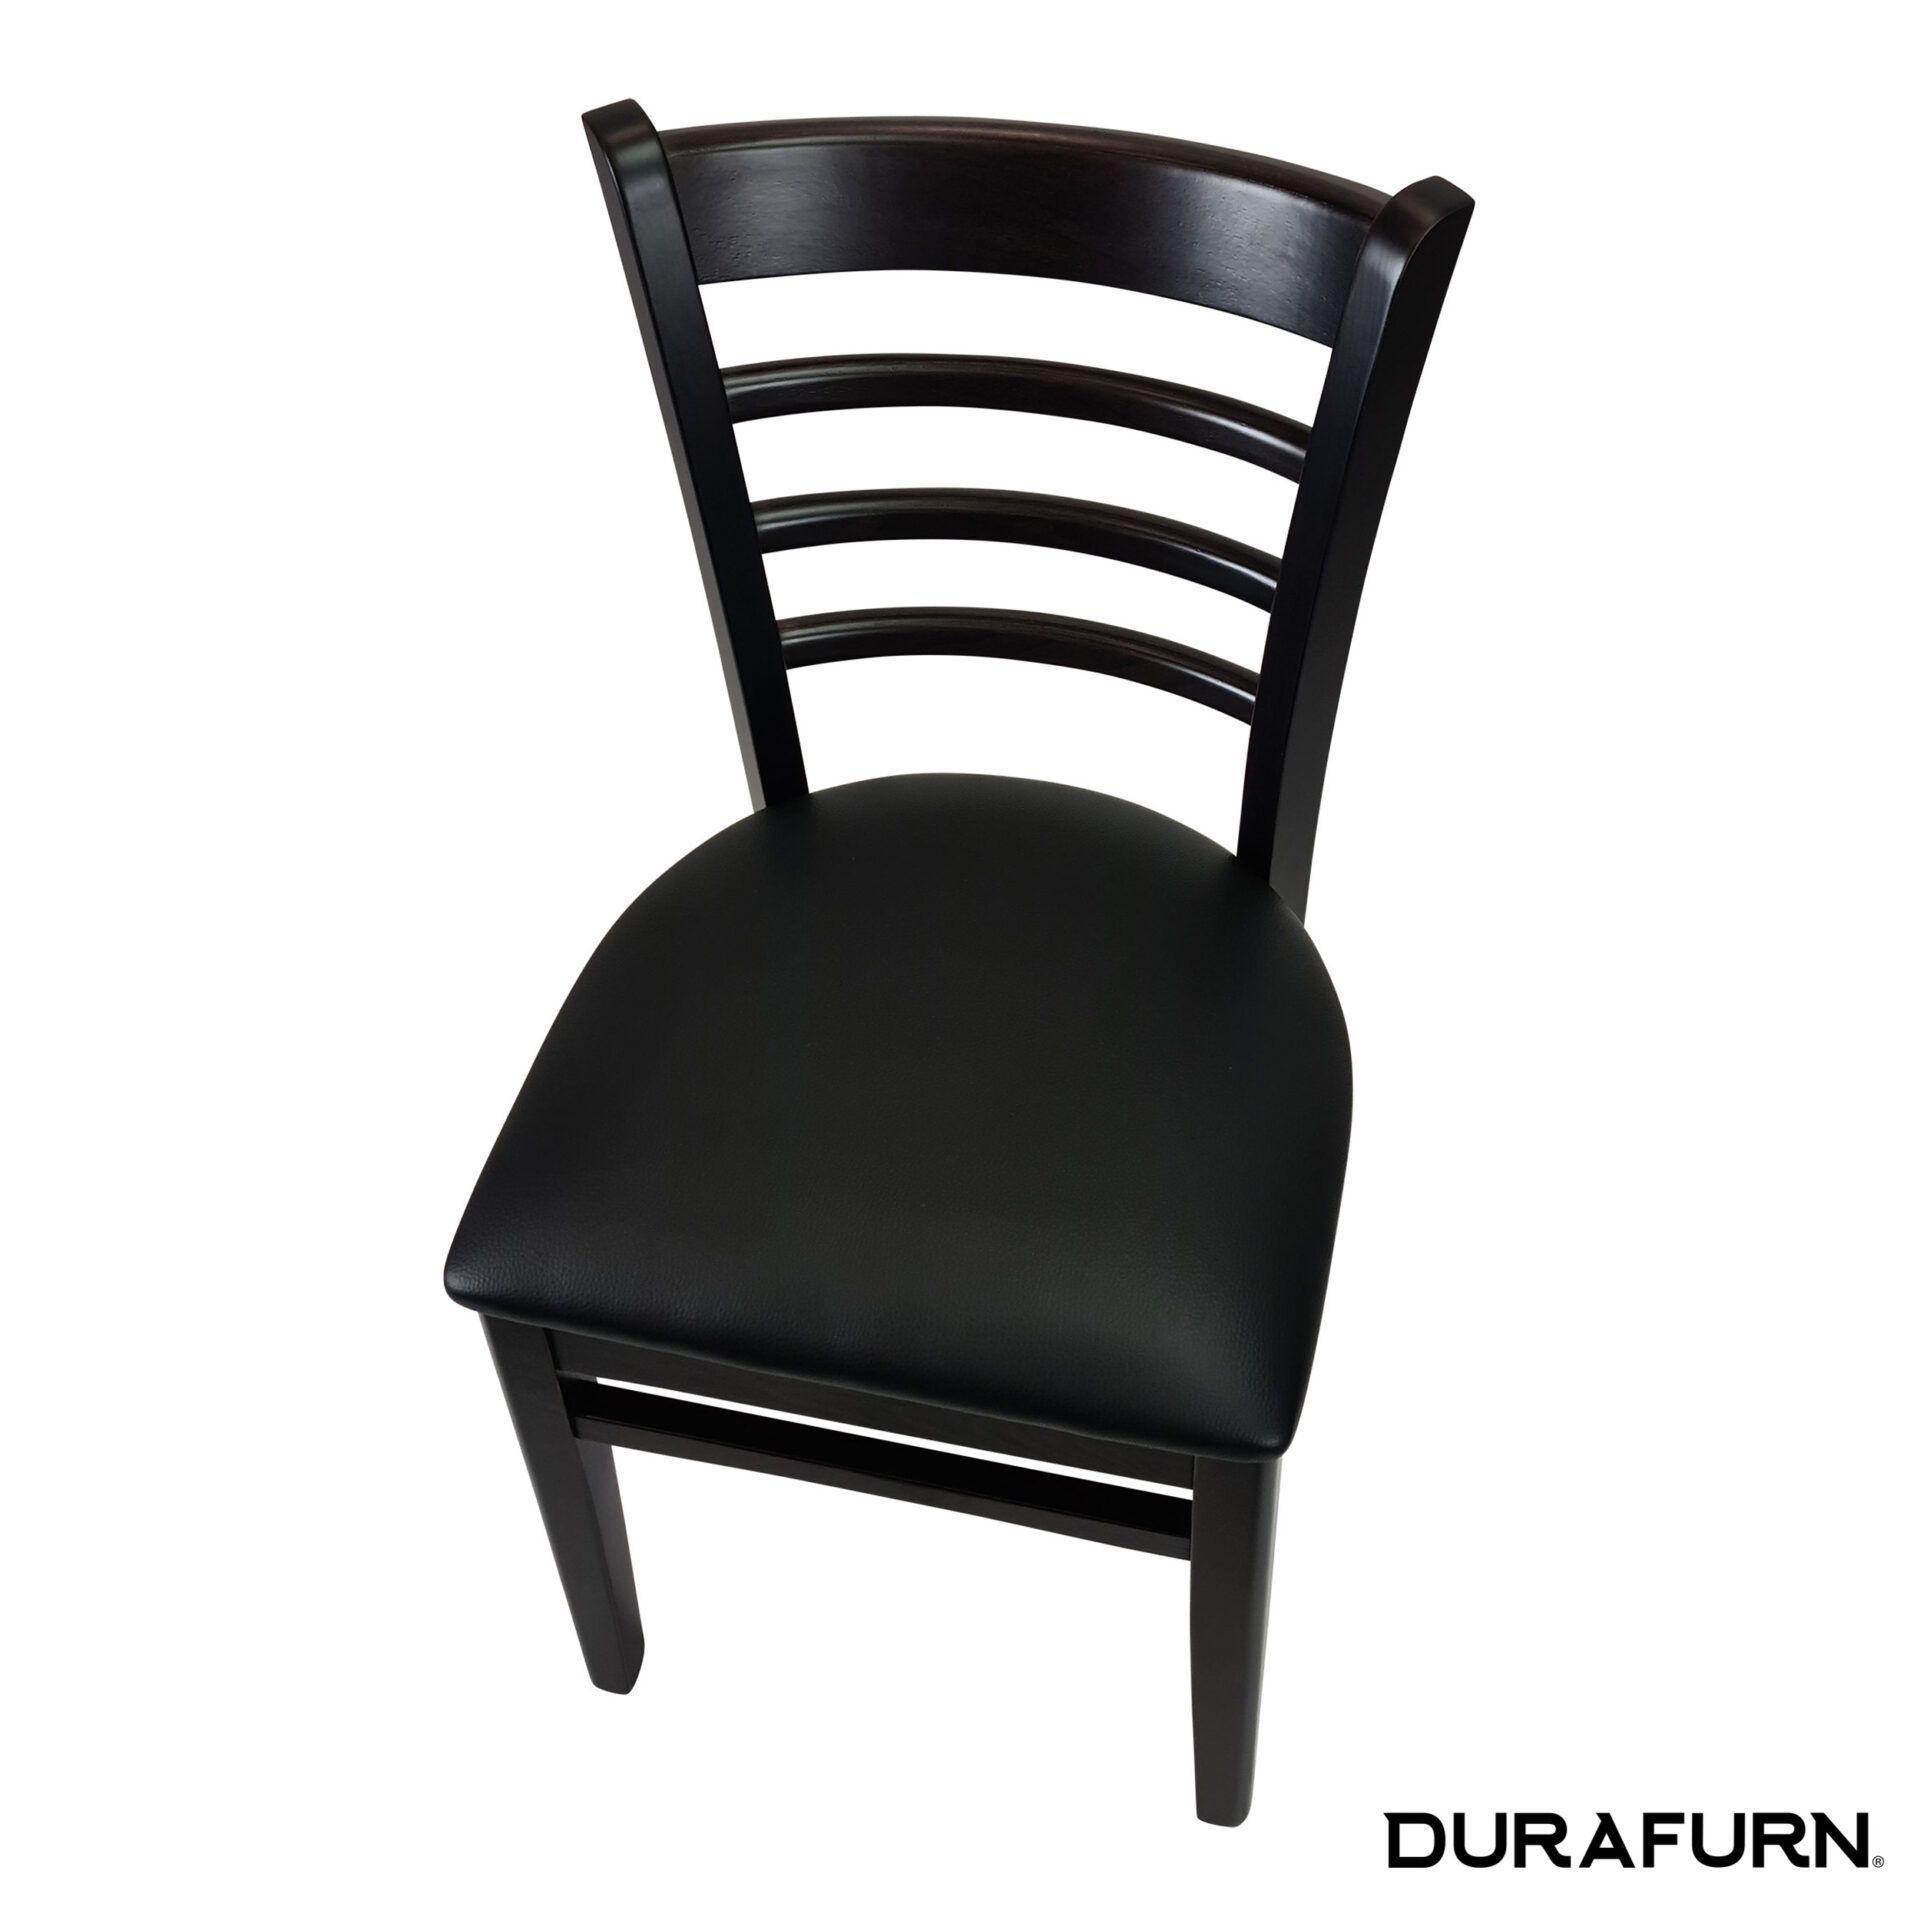 florence chair wenge black cushion top angle